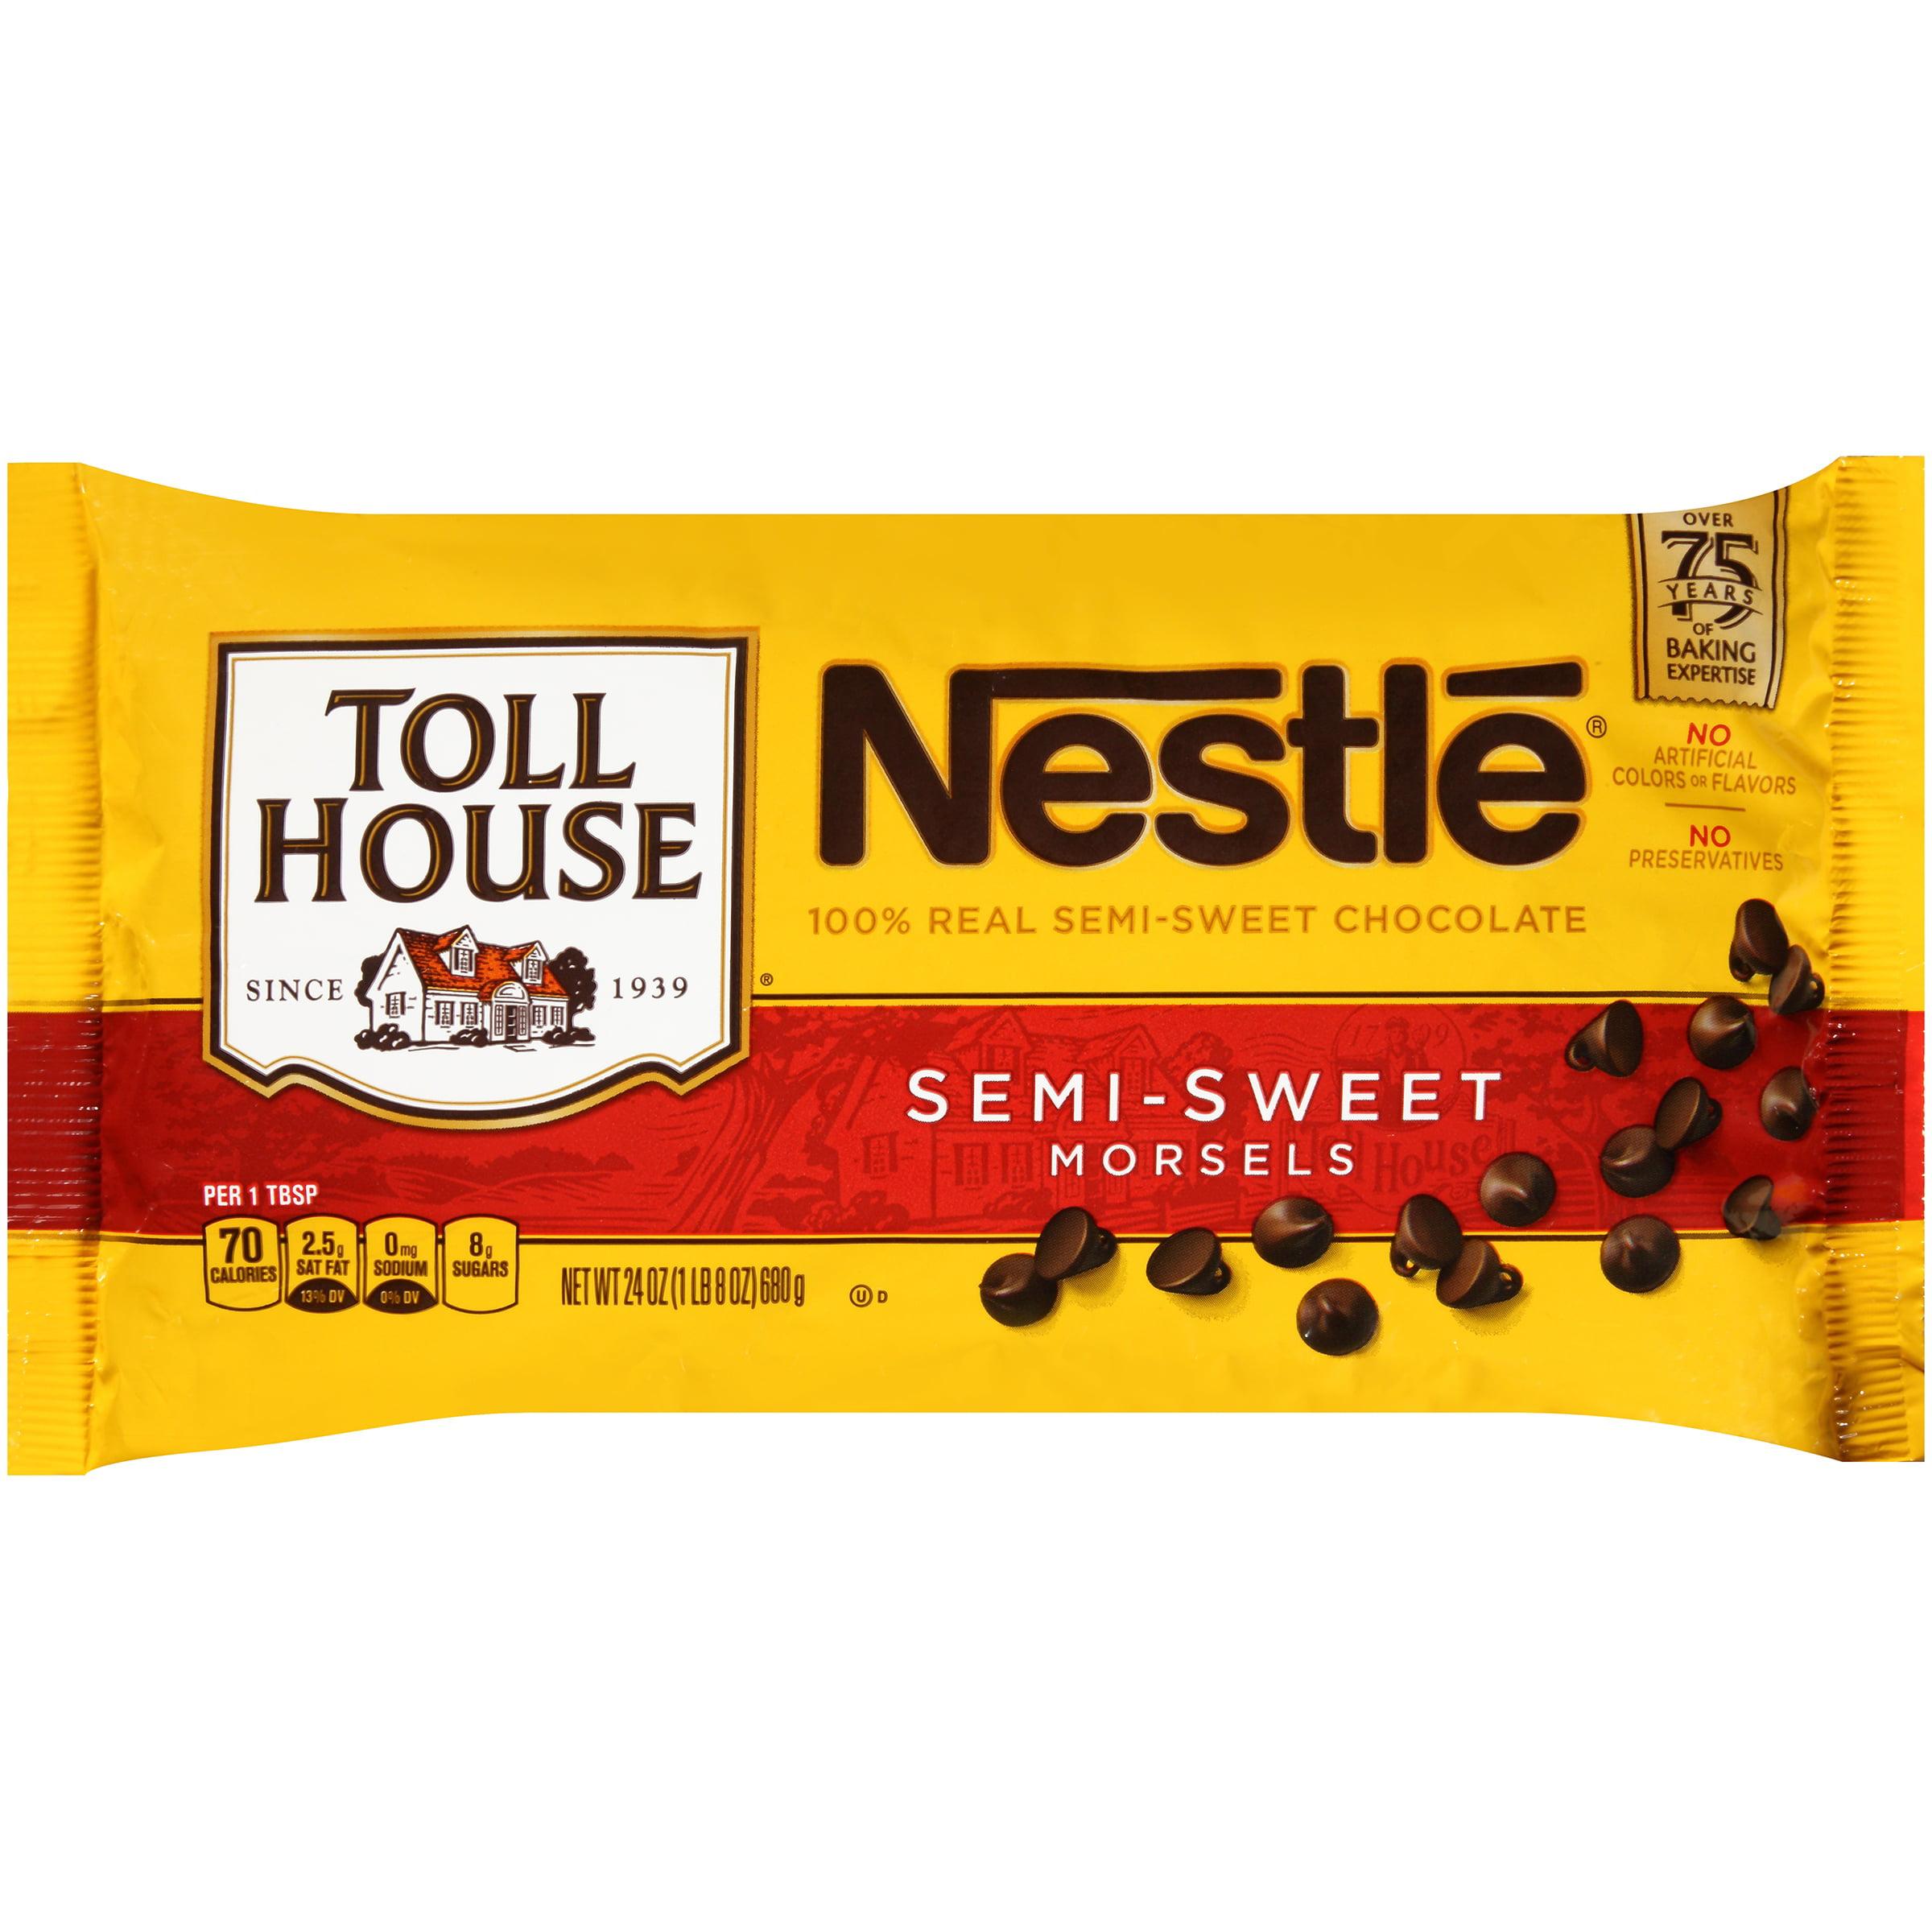 Nestle TOLL HOUSE Semi-Sweet Chocolate Morsels 24 oz. Bag